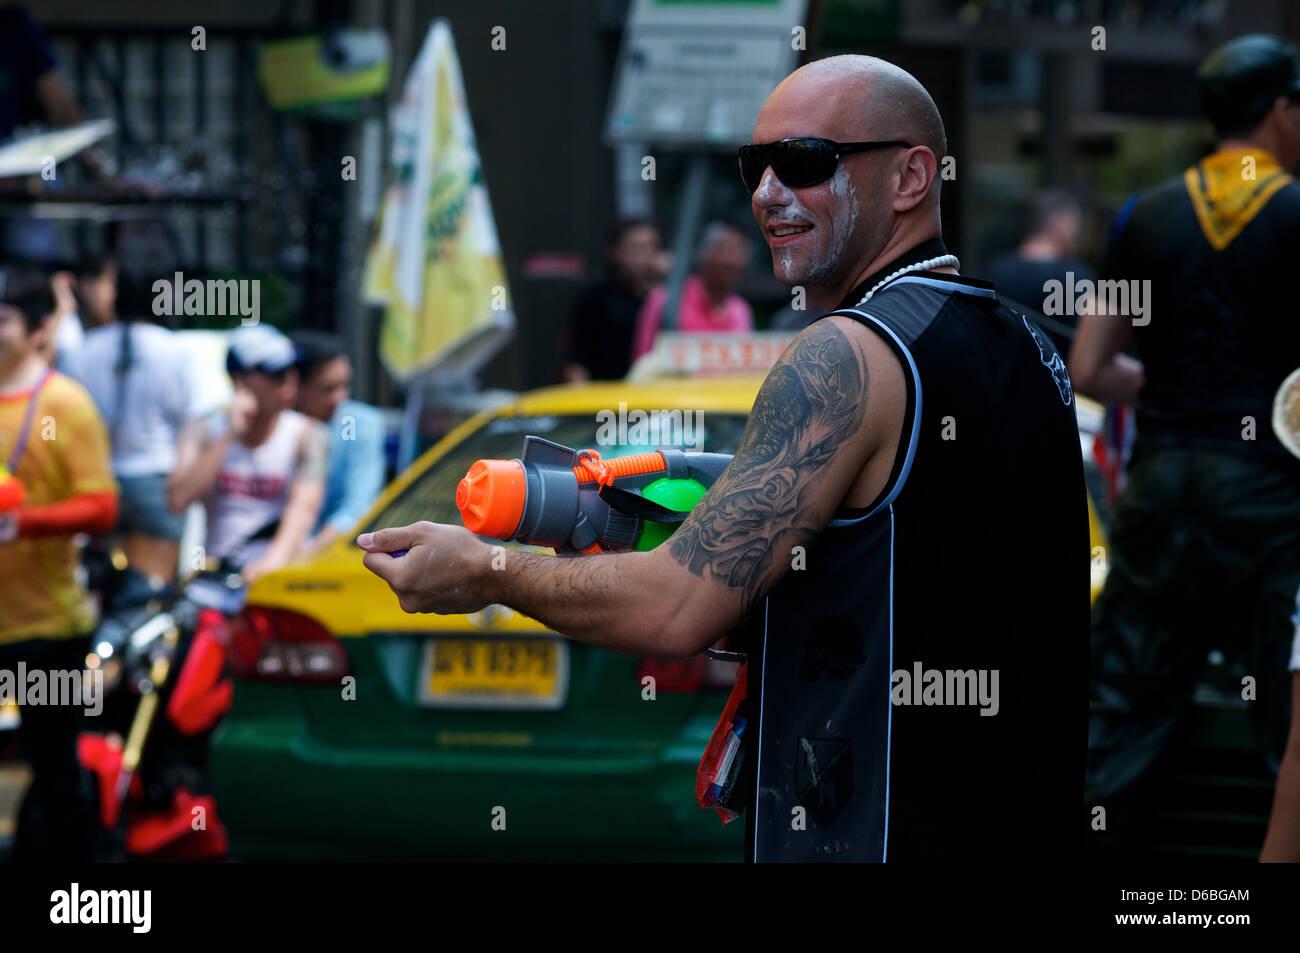 a tourist & his water gun. Bangkok celebrates Songkran, the Thai new year. Bangkok, Thailand. credit: Kraig - Stock Image